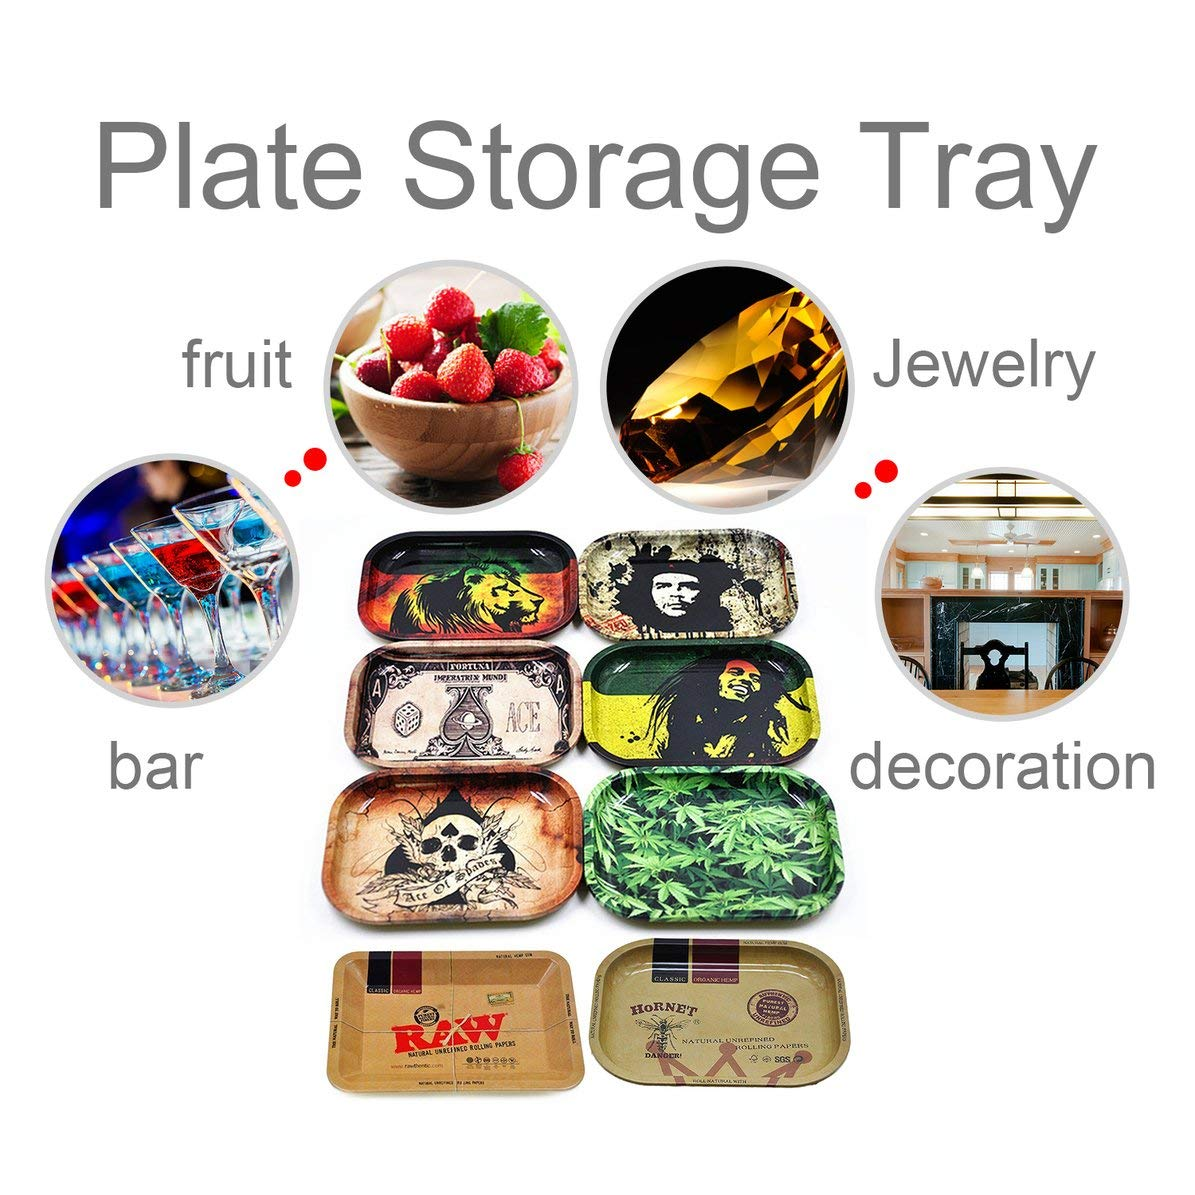 Rectangle Plate Storage Tray 180x140x15mm Rolling Trays Decorative Dish Snack Dried Fruit Storage Organizer